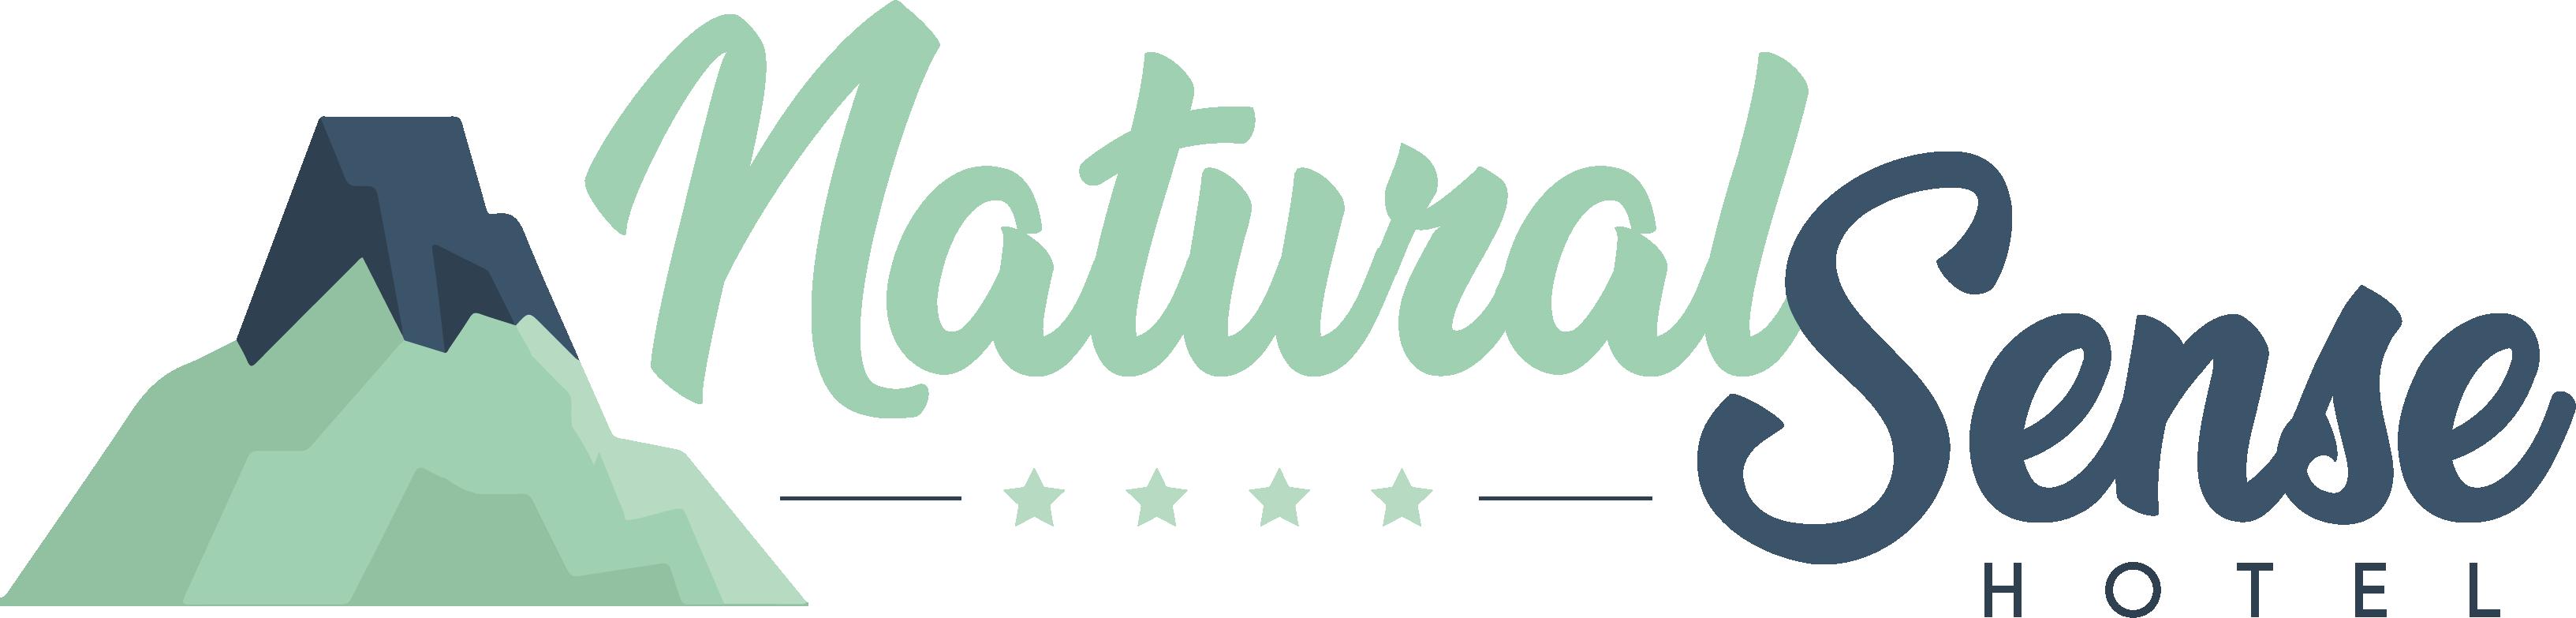 NaturalSense Hotel - Volcano logo inspiration